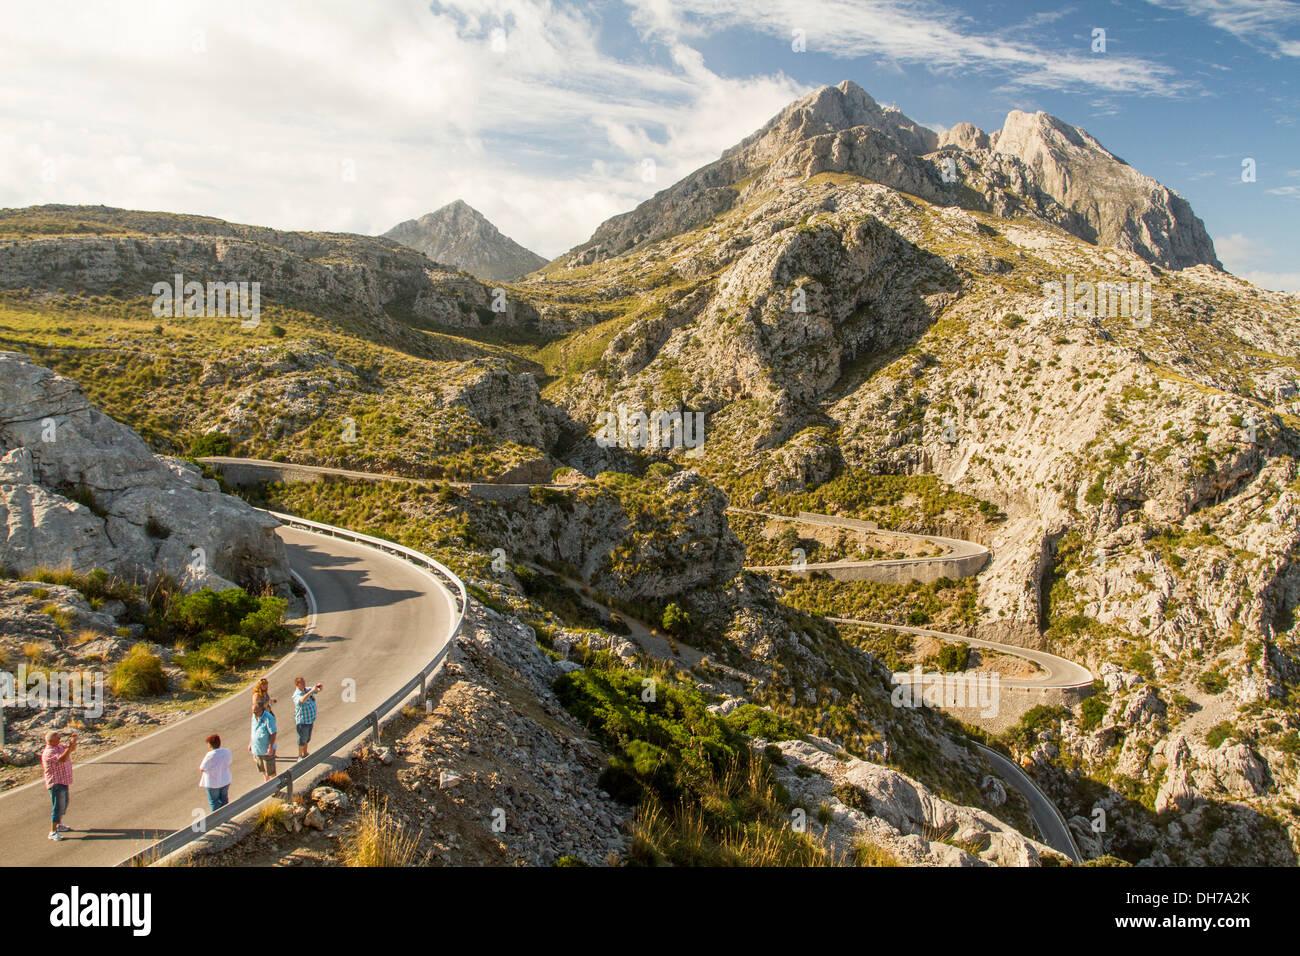 Coll dels Reis, Sa Calobra, Mallorca. - Stock Image